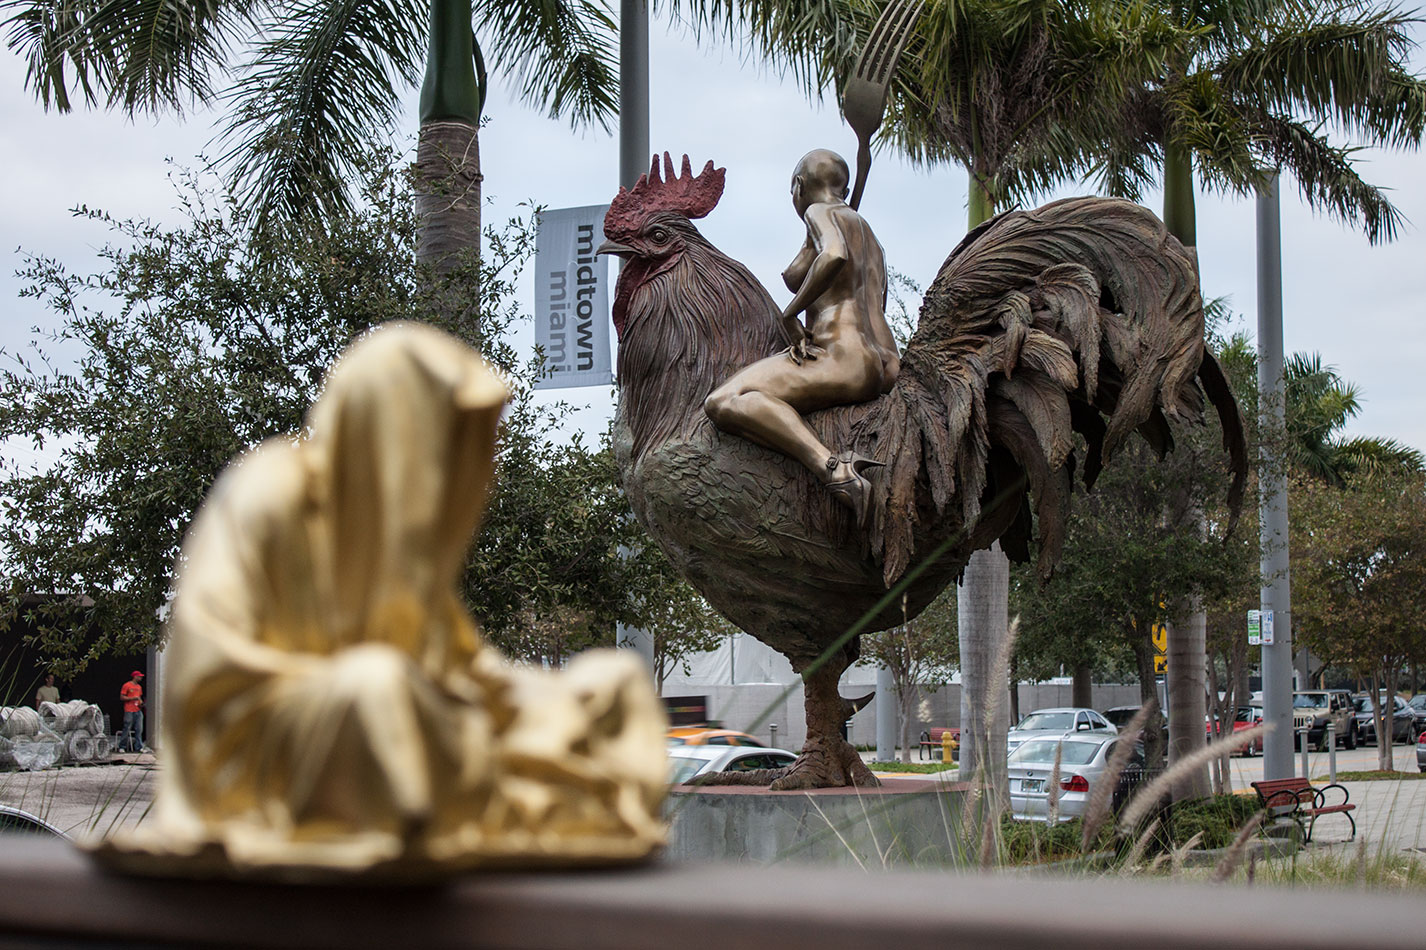 public-art-basel-miami-beach-fair-usa-florida-bass-museum-guardians-of-time-manfred-kili-kielnhofer-contemporary-fine-art-modern-arts-design-antiques-sculpture-6670